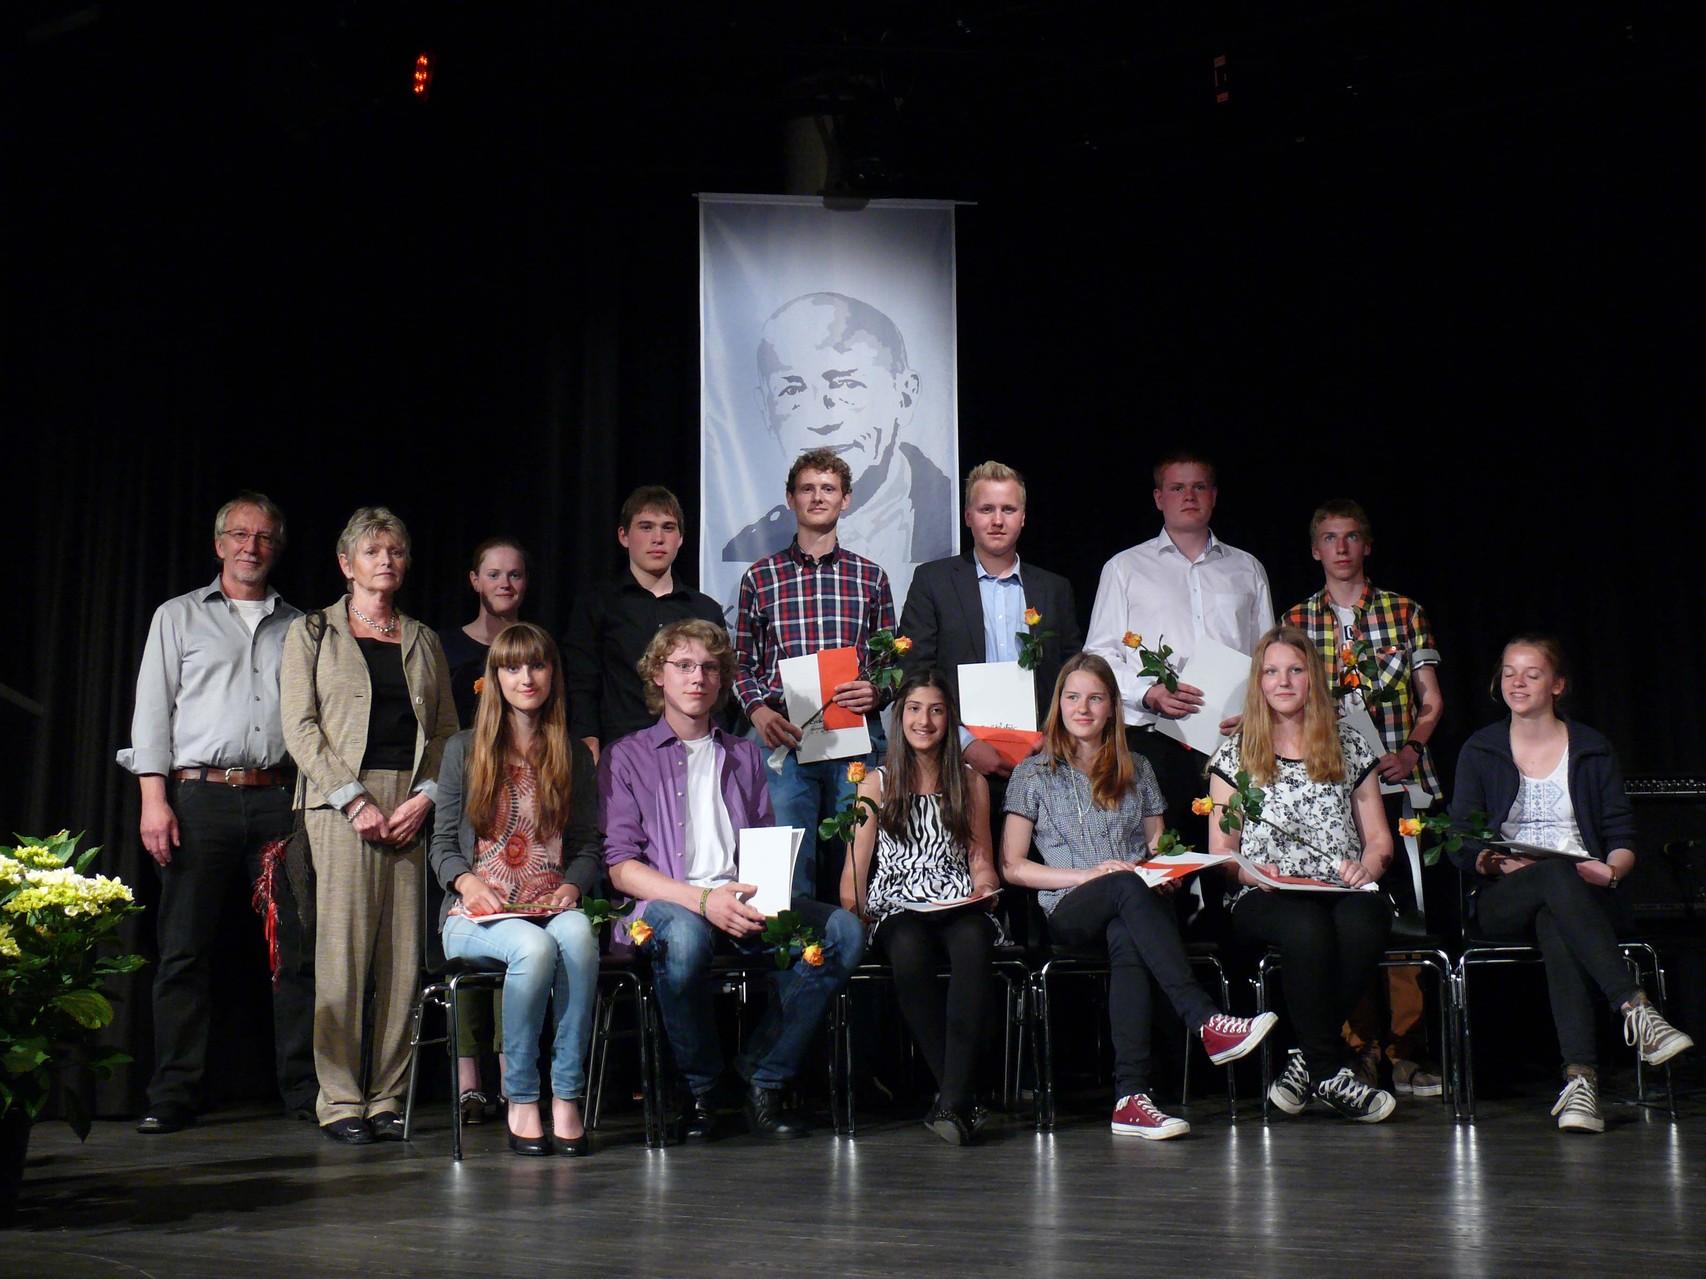 Die KEL-Preisträger 2014; links im Bild Preis-Organisator Hartmut Hoppe, daneben Juliane Ketcher-Levy. (Foto: Proske)